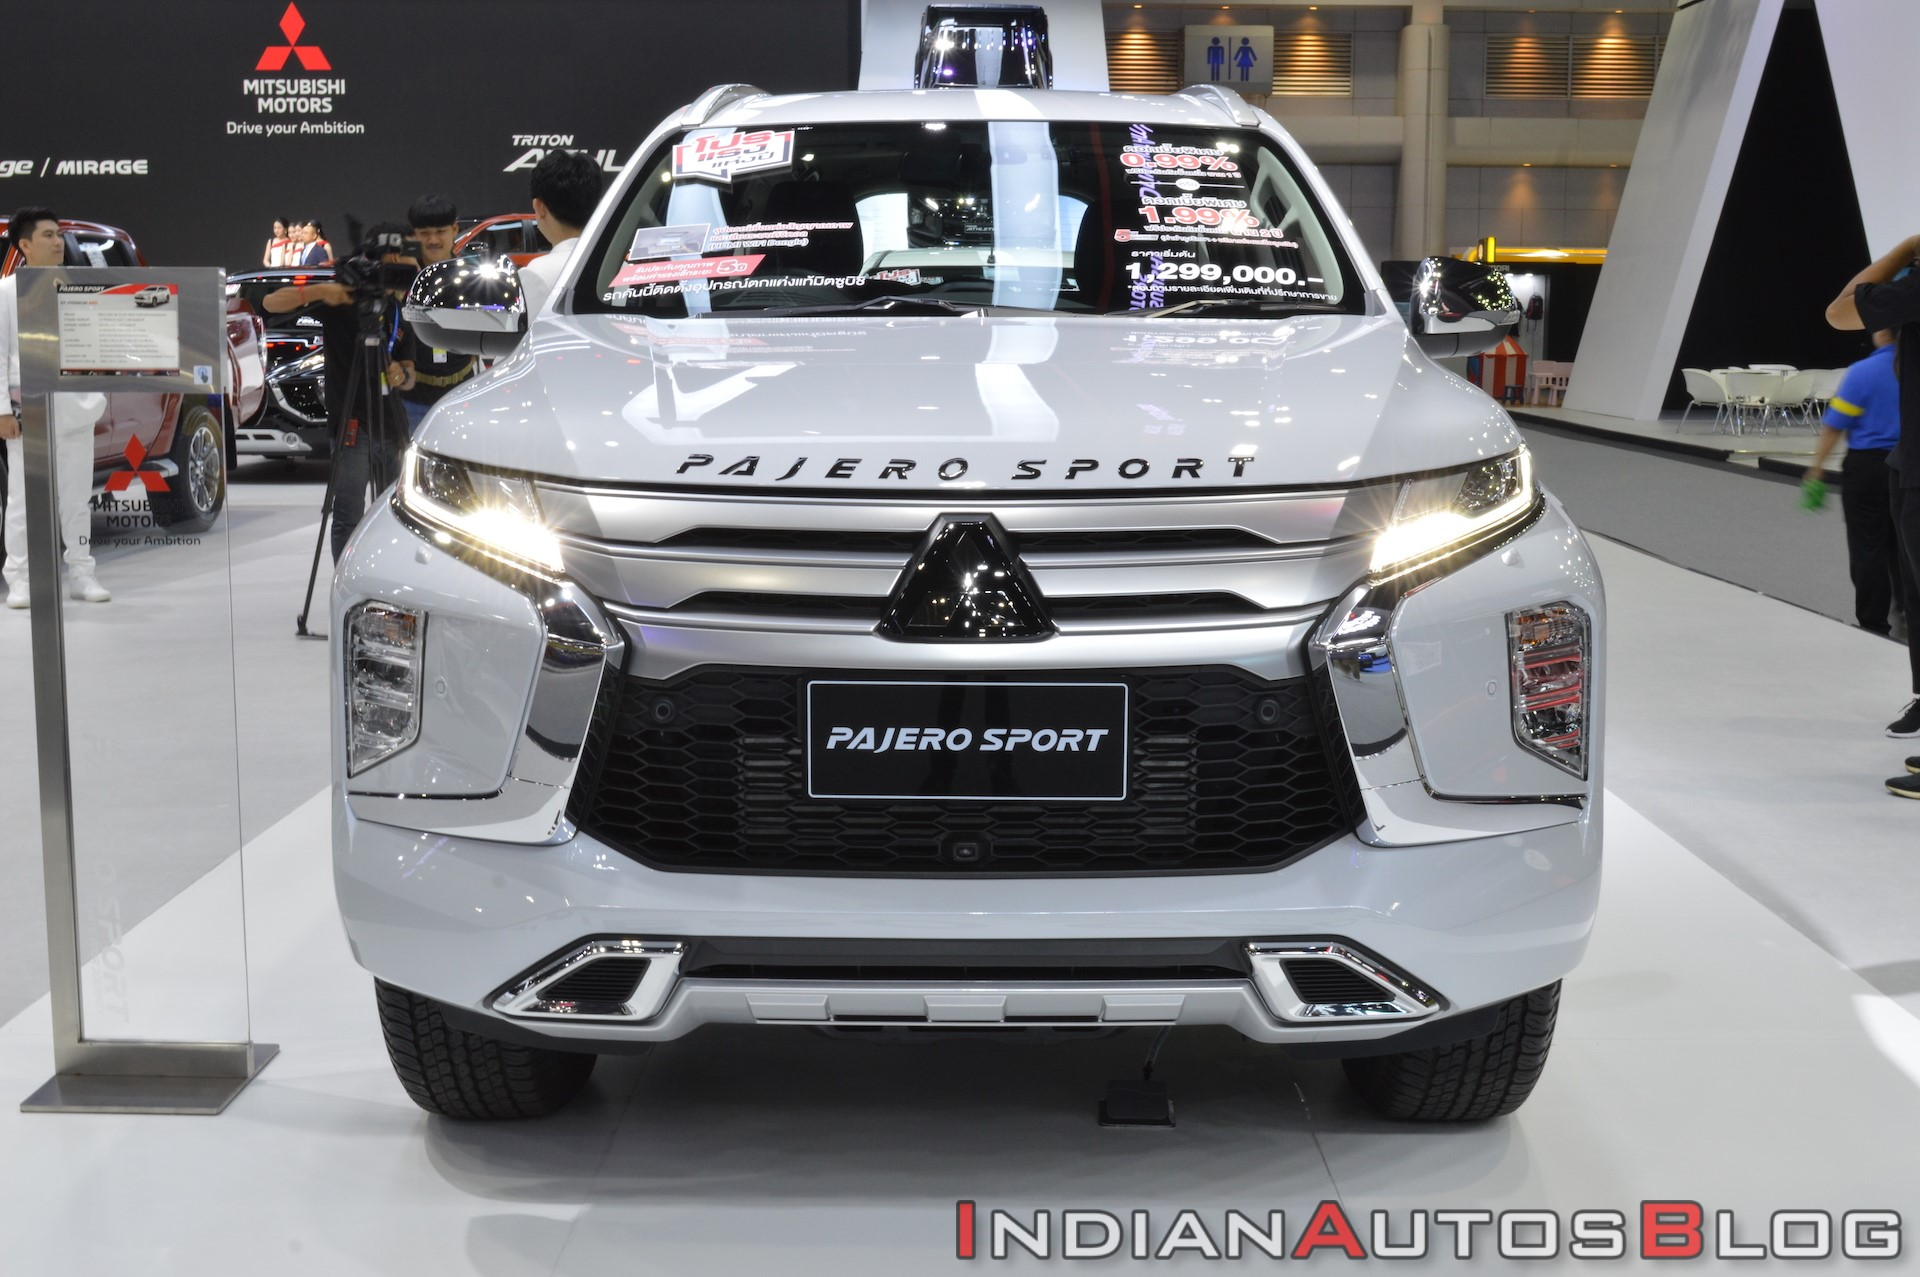 All New Mitsubishi Pajero Sport Displayed at 2019 Thai Motor Expo 6